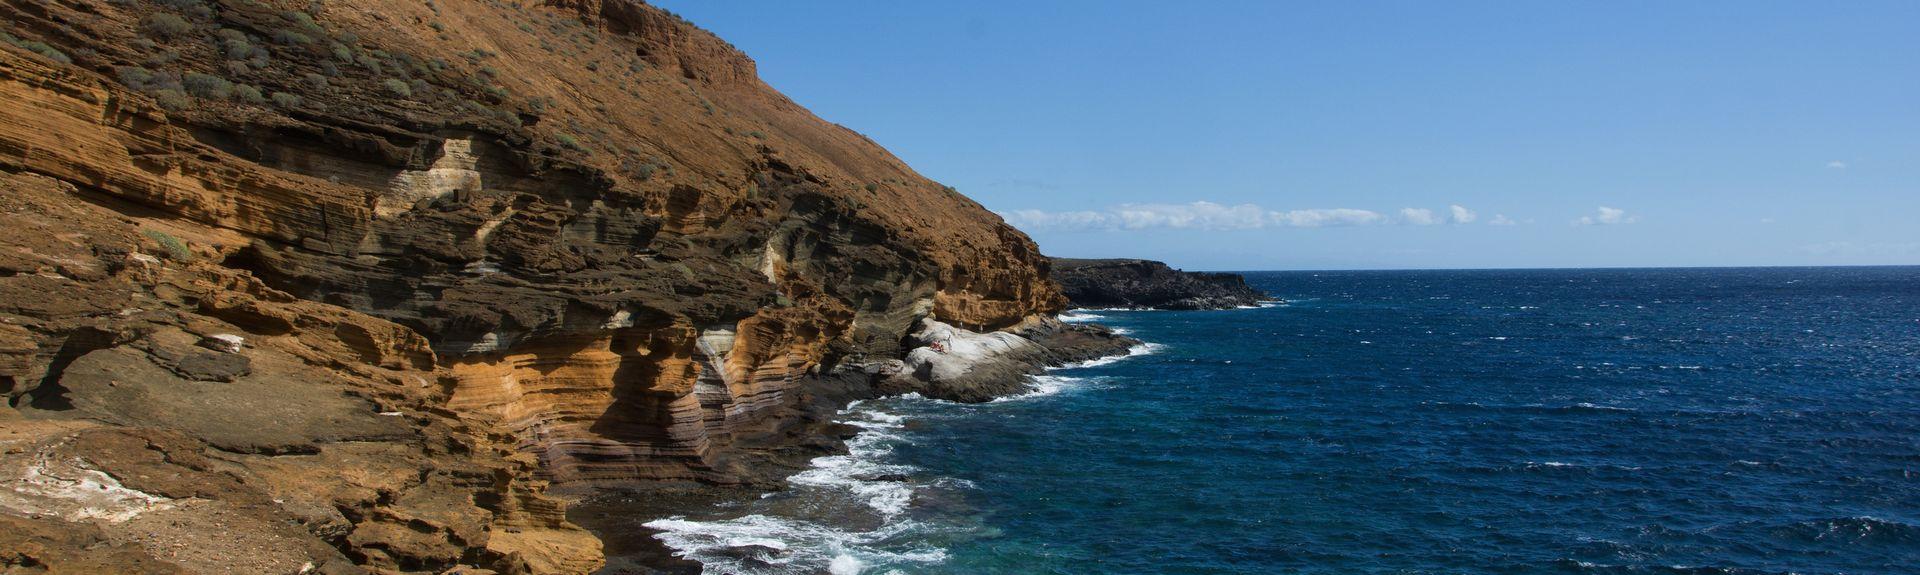 Troya Strand, Playa de las Americas, De Kanariske Øer, Spanien